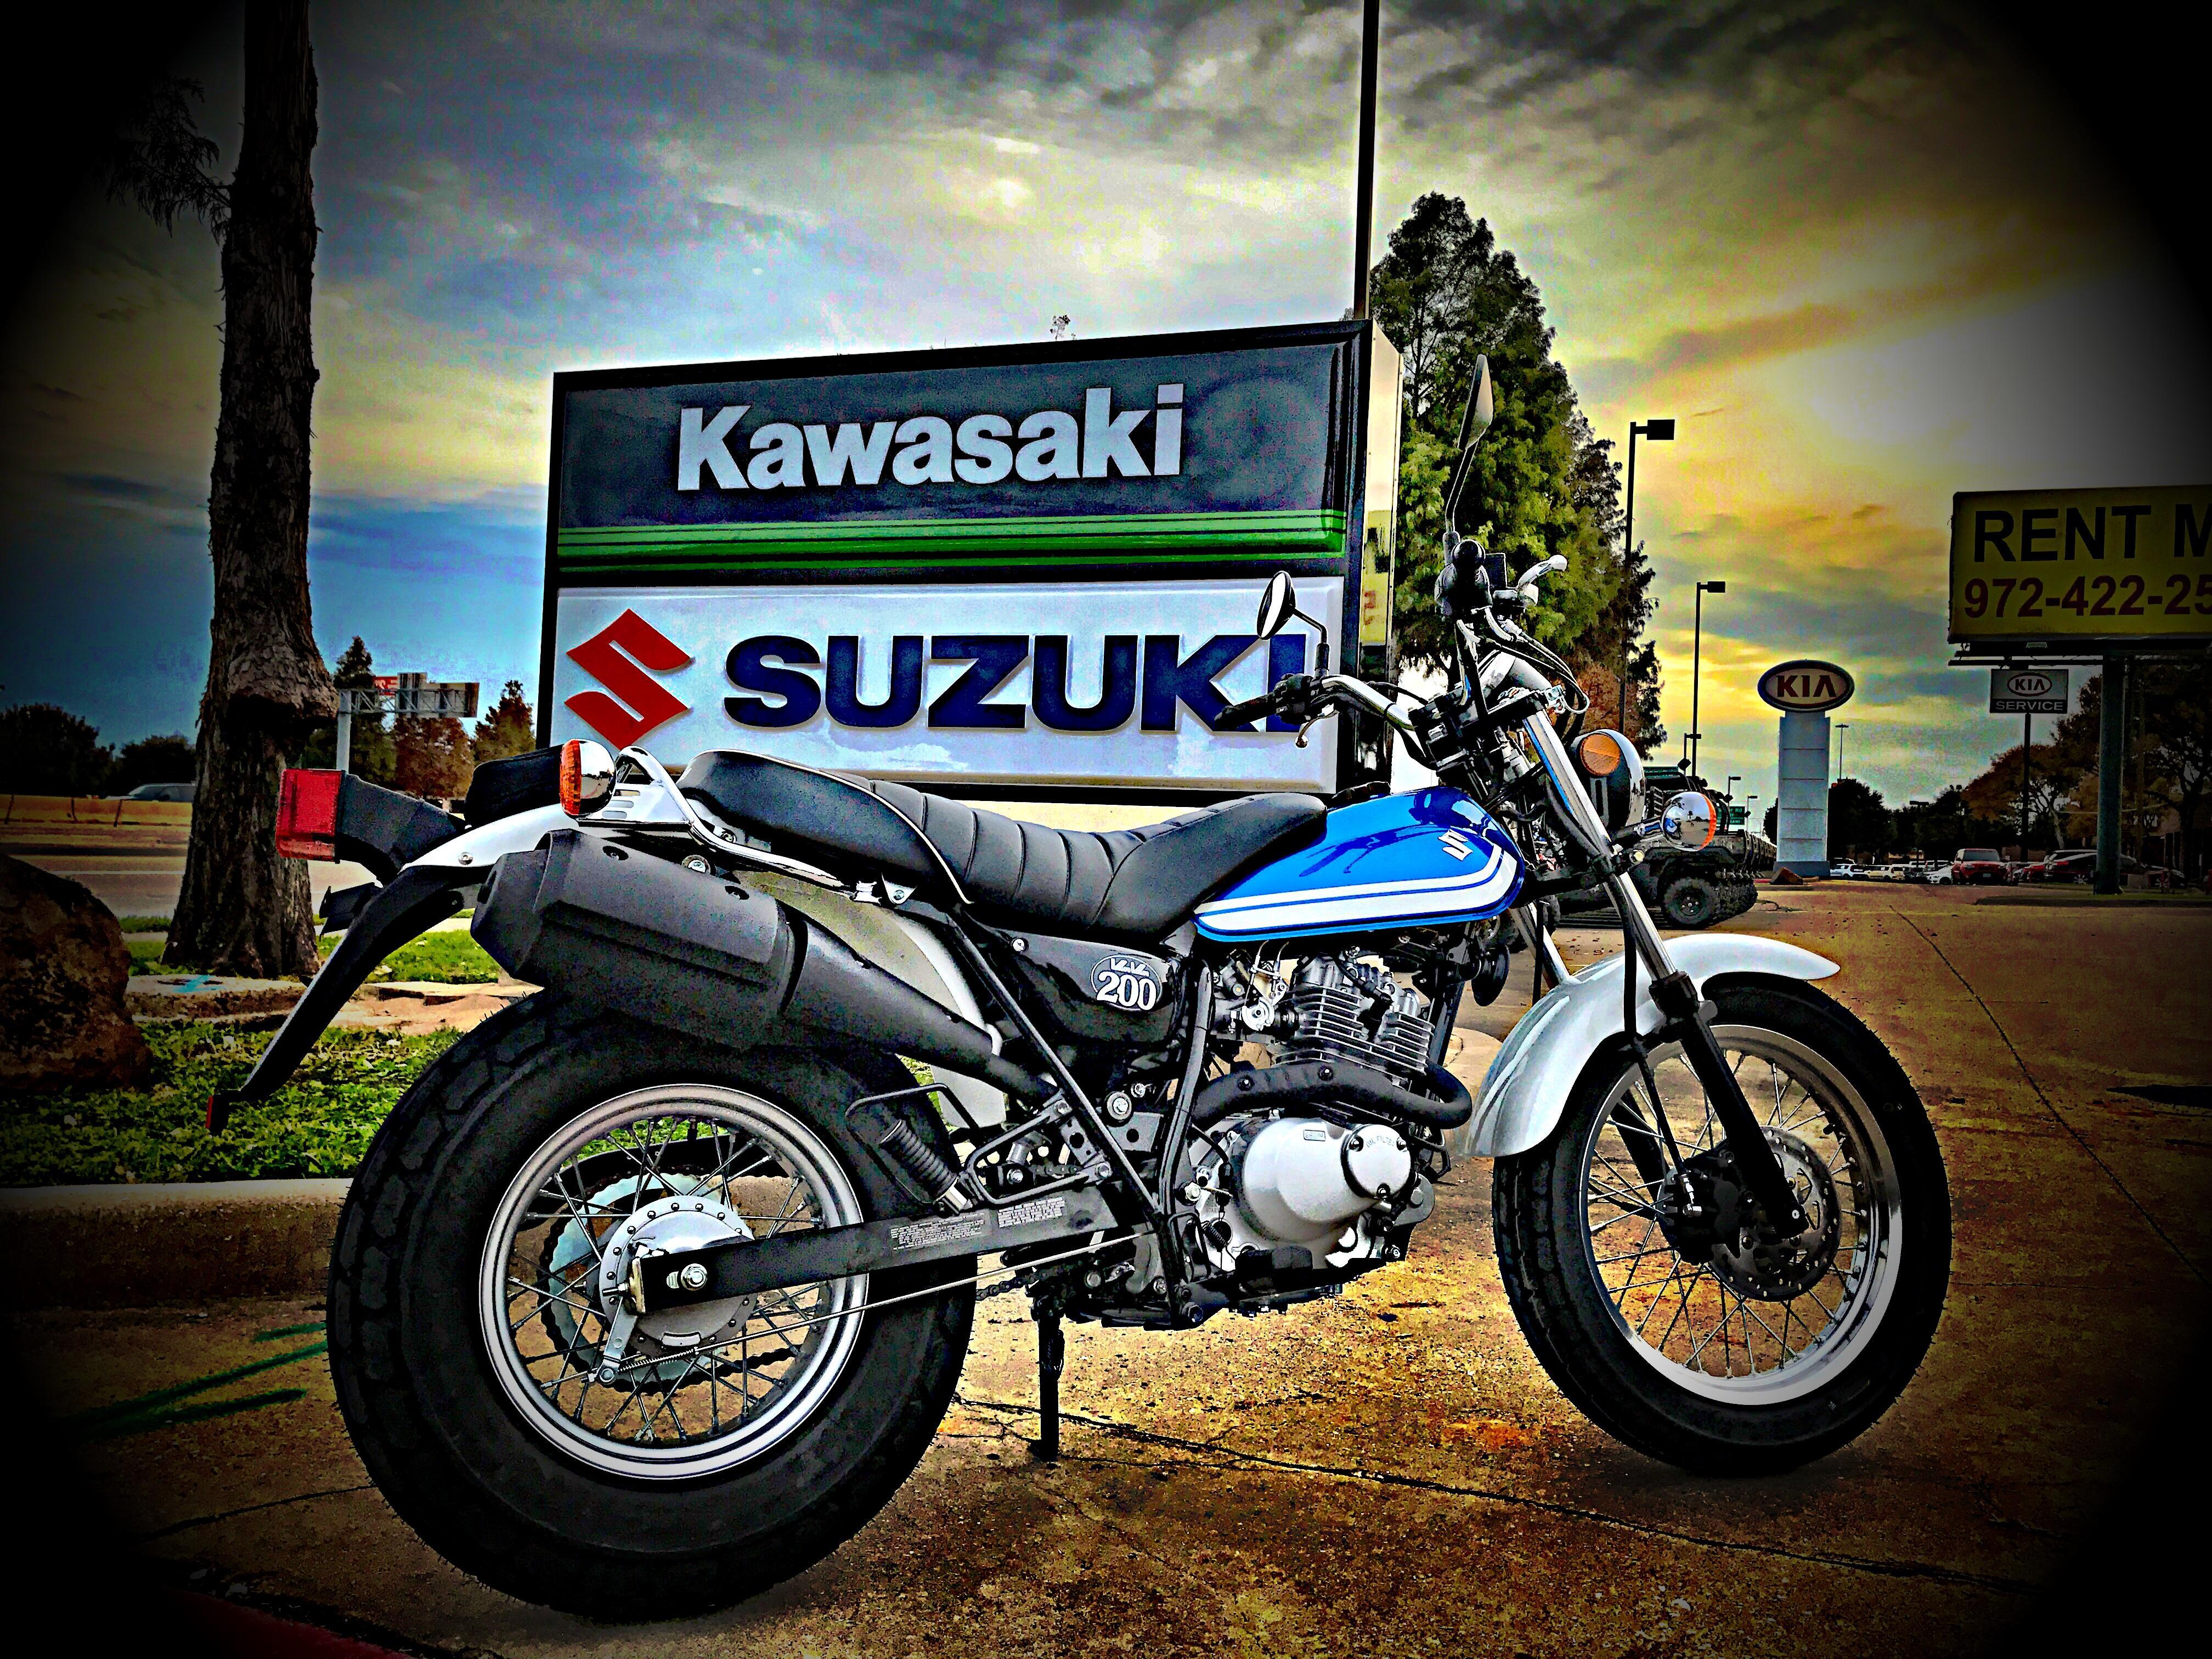 Honda Motorcycle Dealer Plano >> Plano Kawasaki Suzuki in Plano, TX 75023 - ChamberofCommerce.com